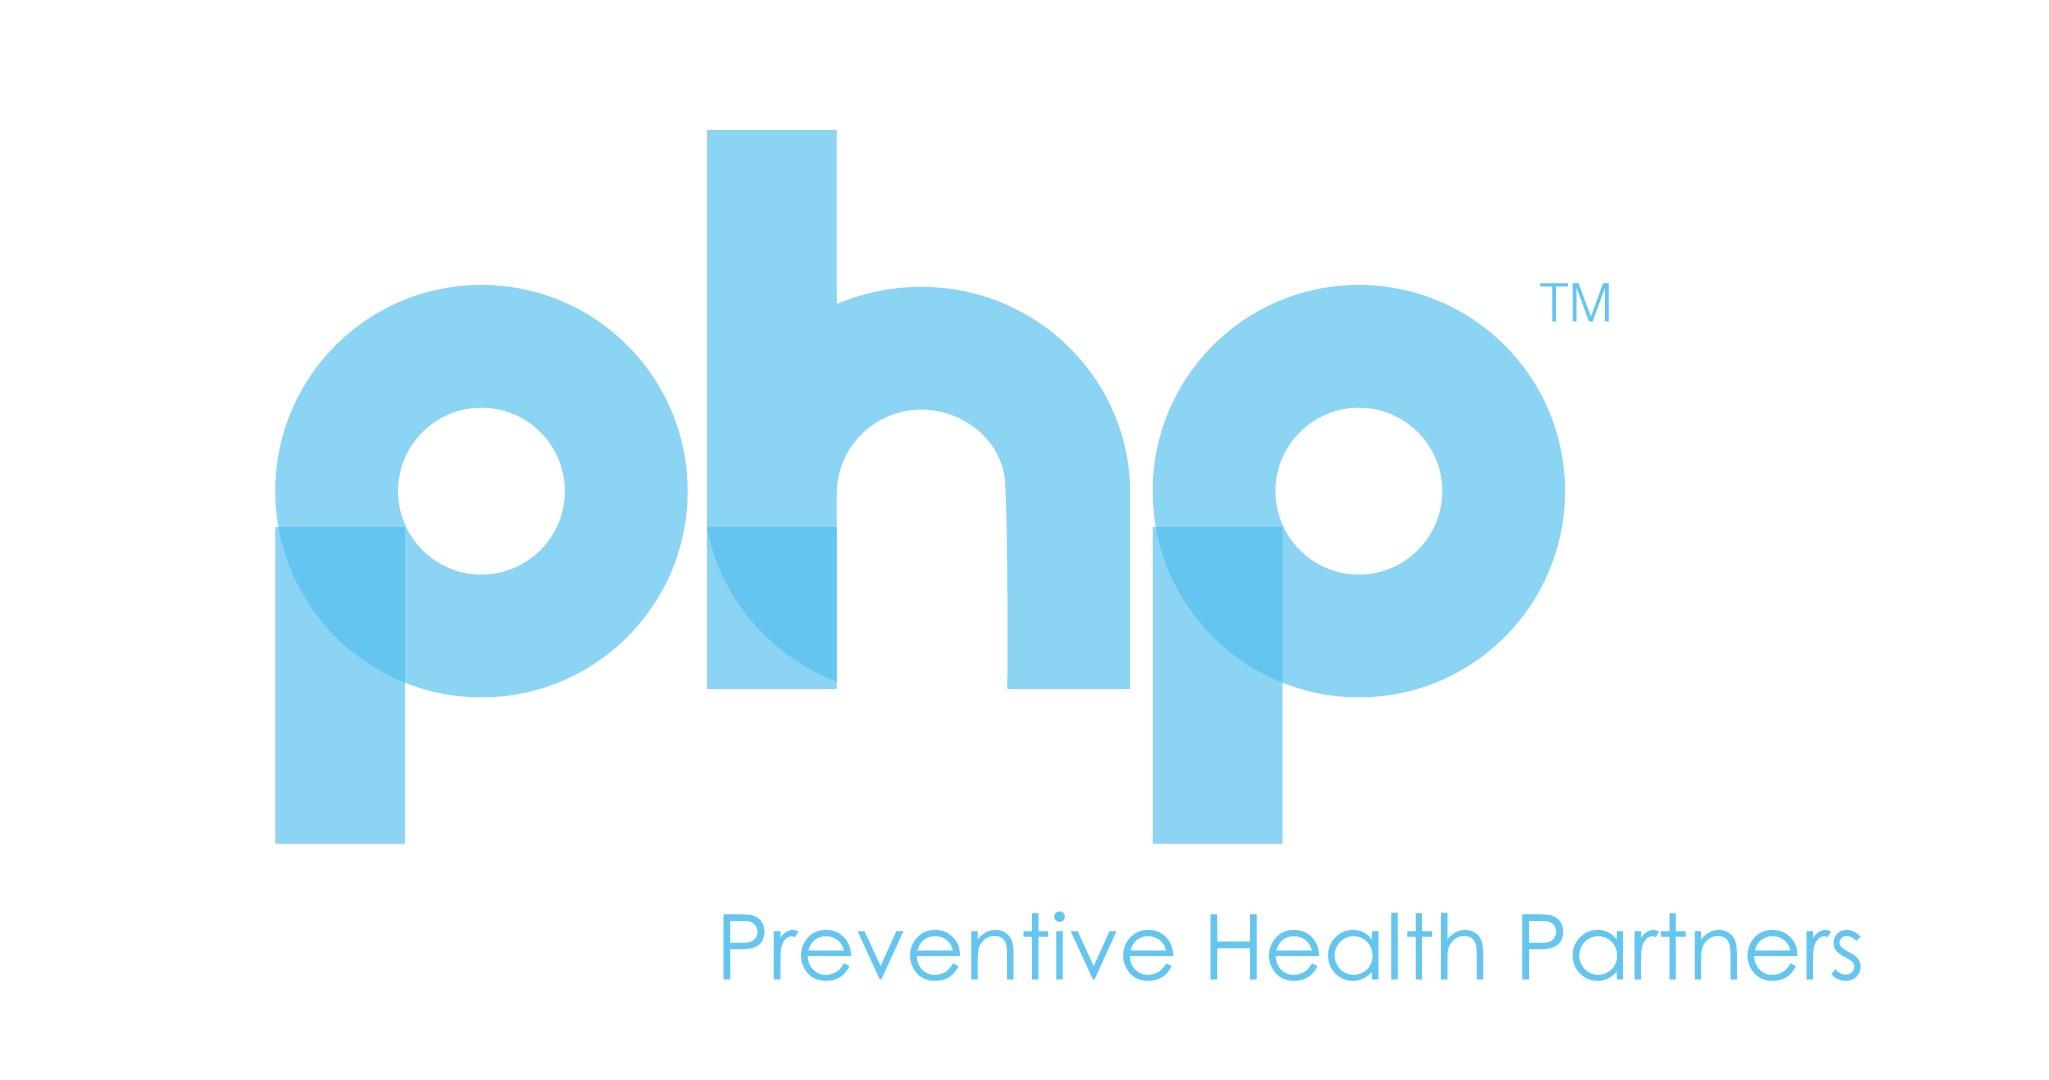 Preventive Health Partners